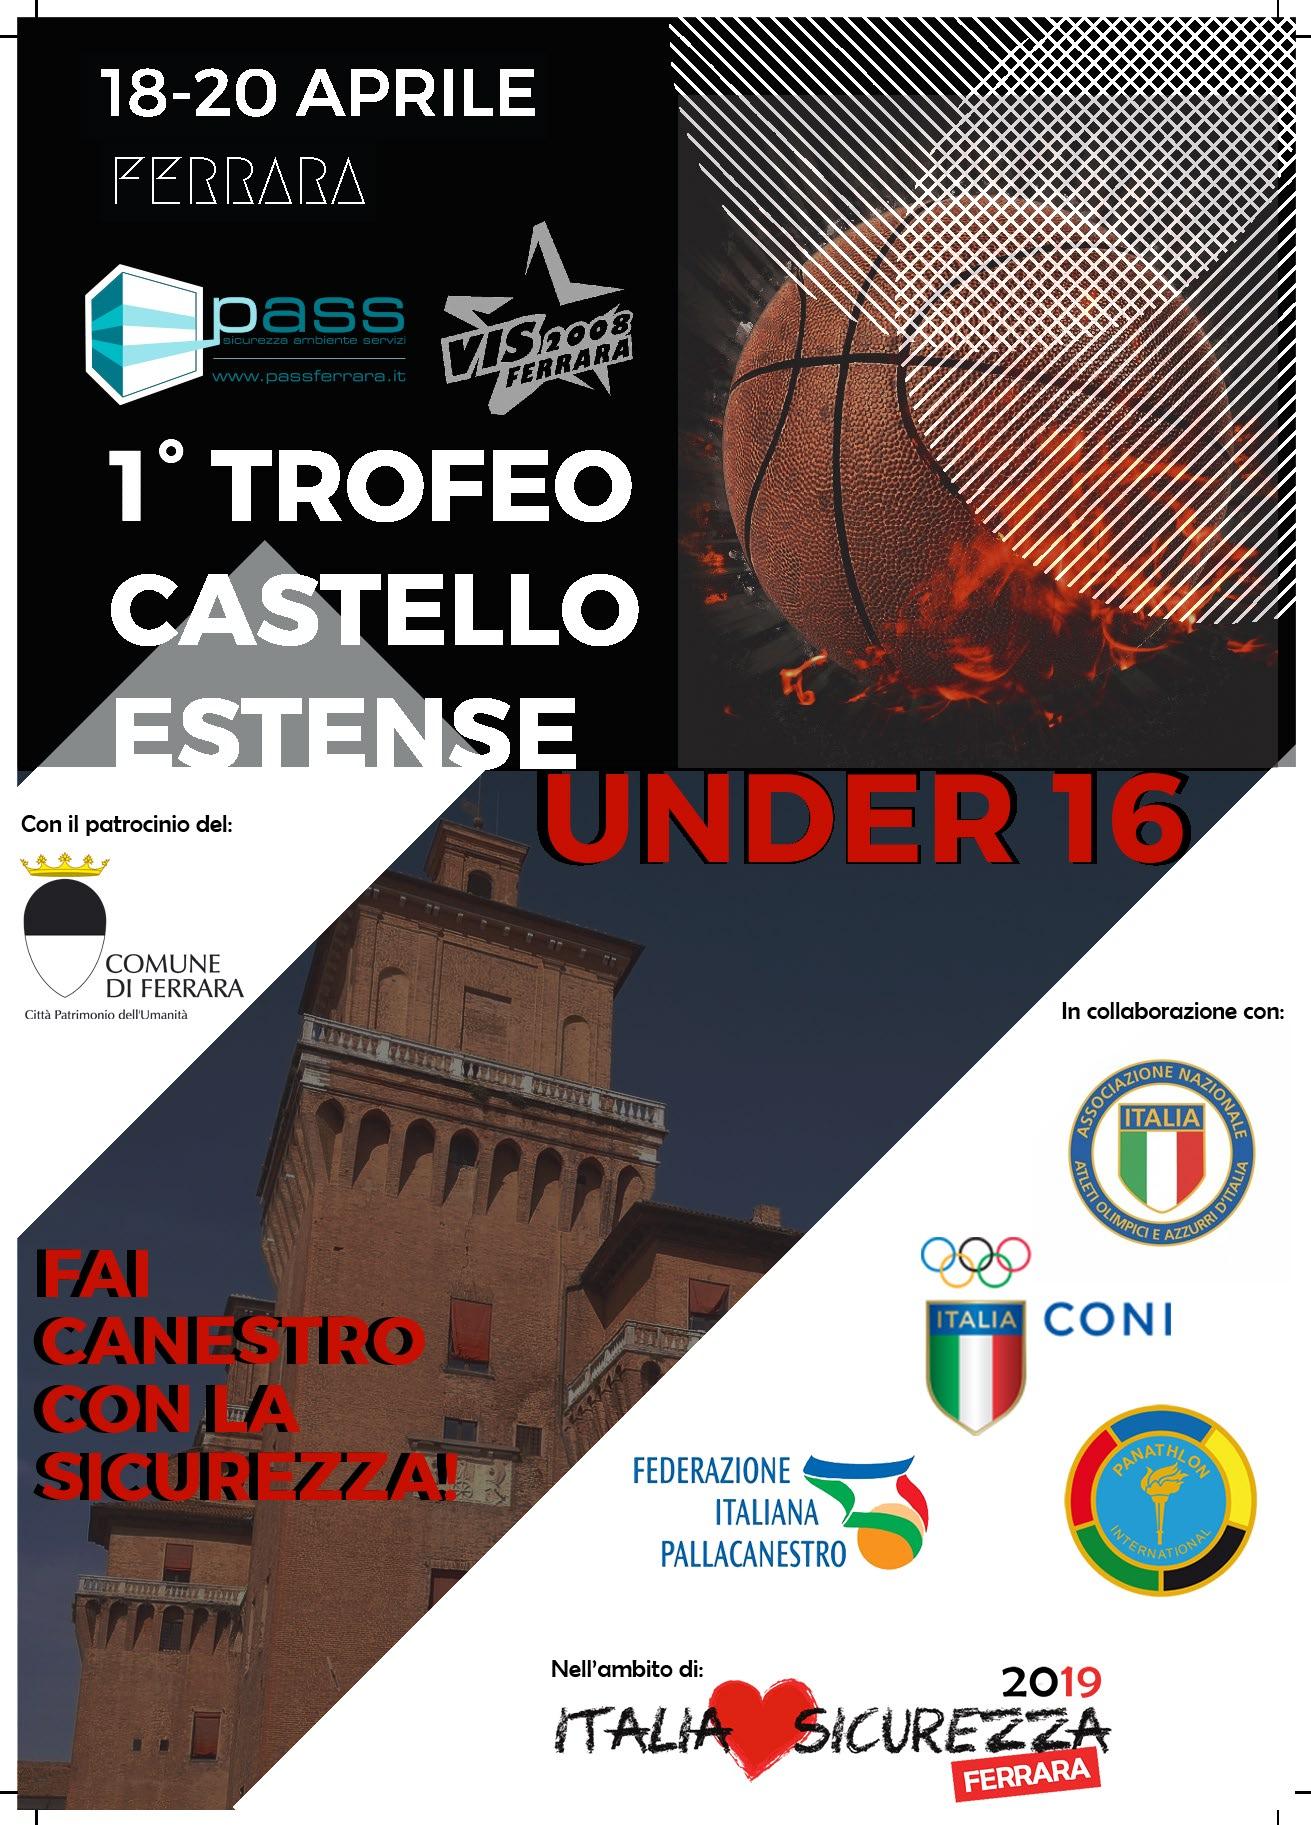 https://www.fondlhs.org/wp-content/uploads/2019/04/Manifesto-trofeo-estense.jpg